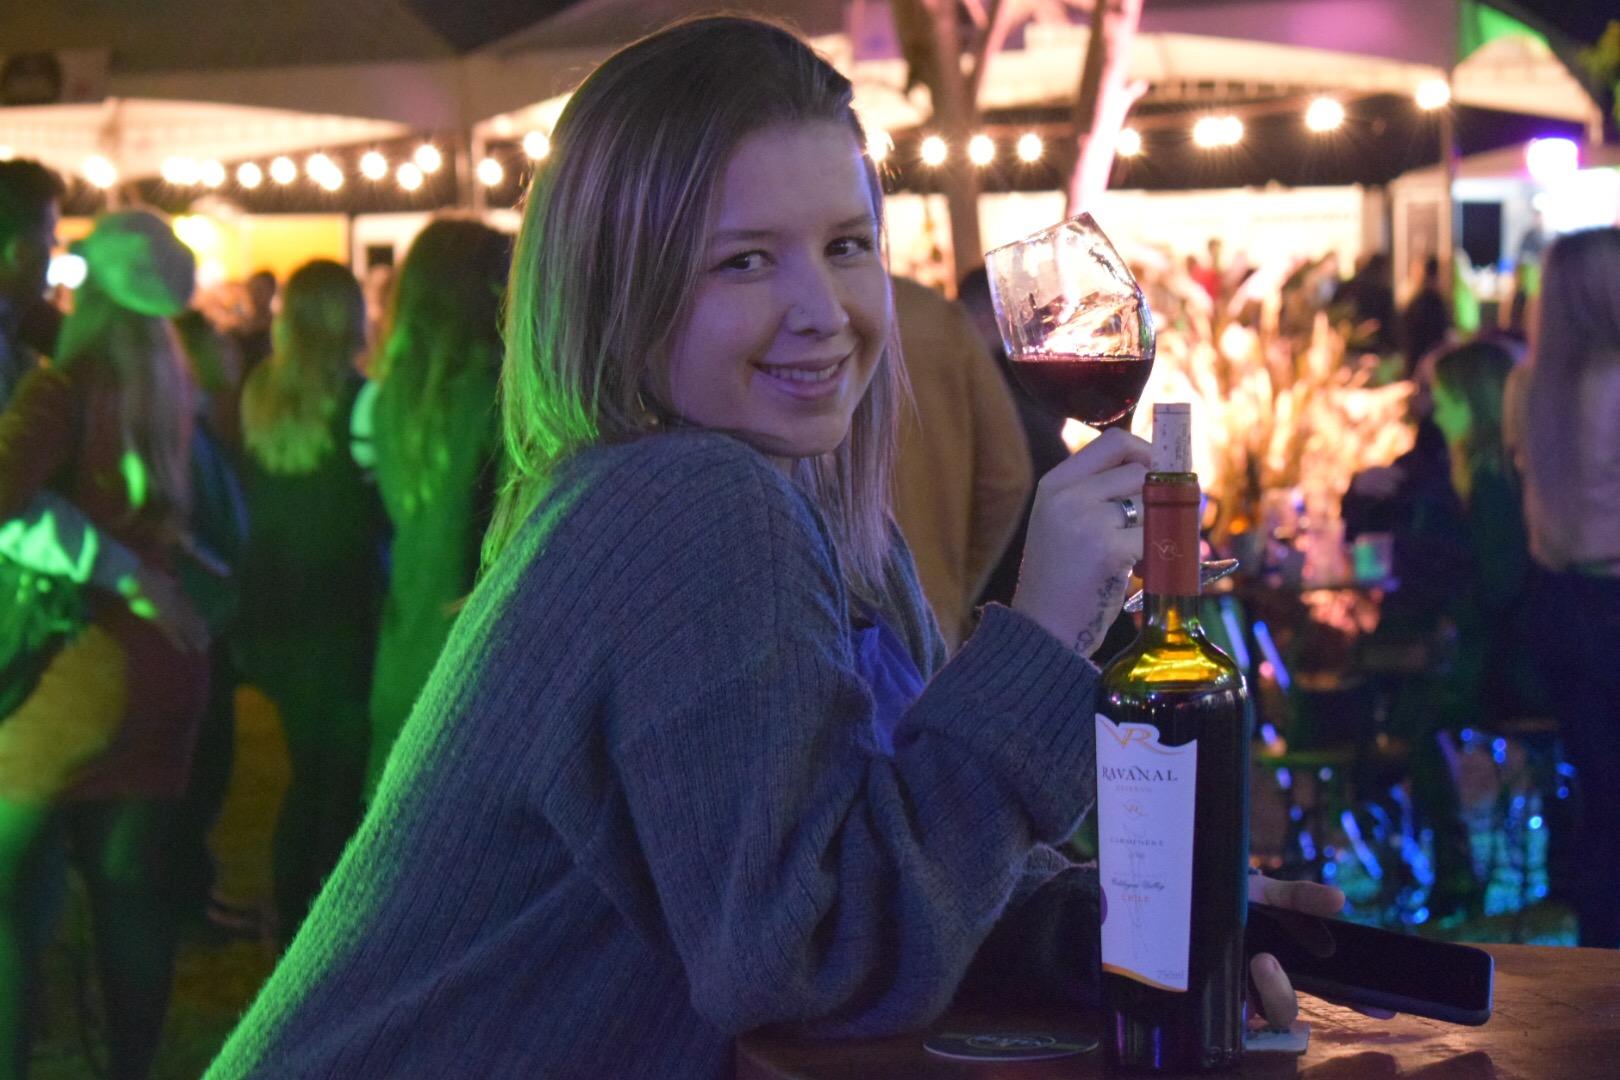 evento - Festival Castelo Wine Beer